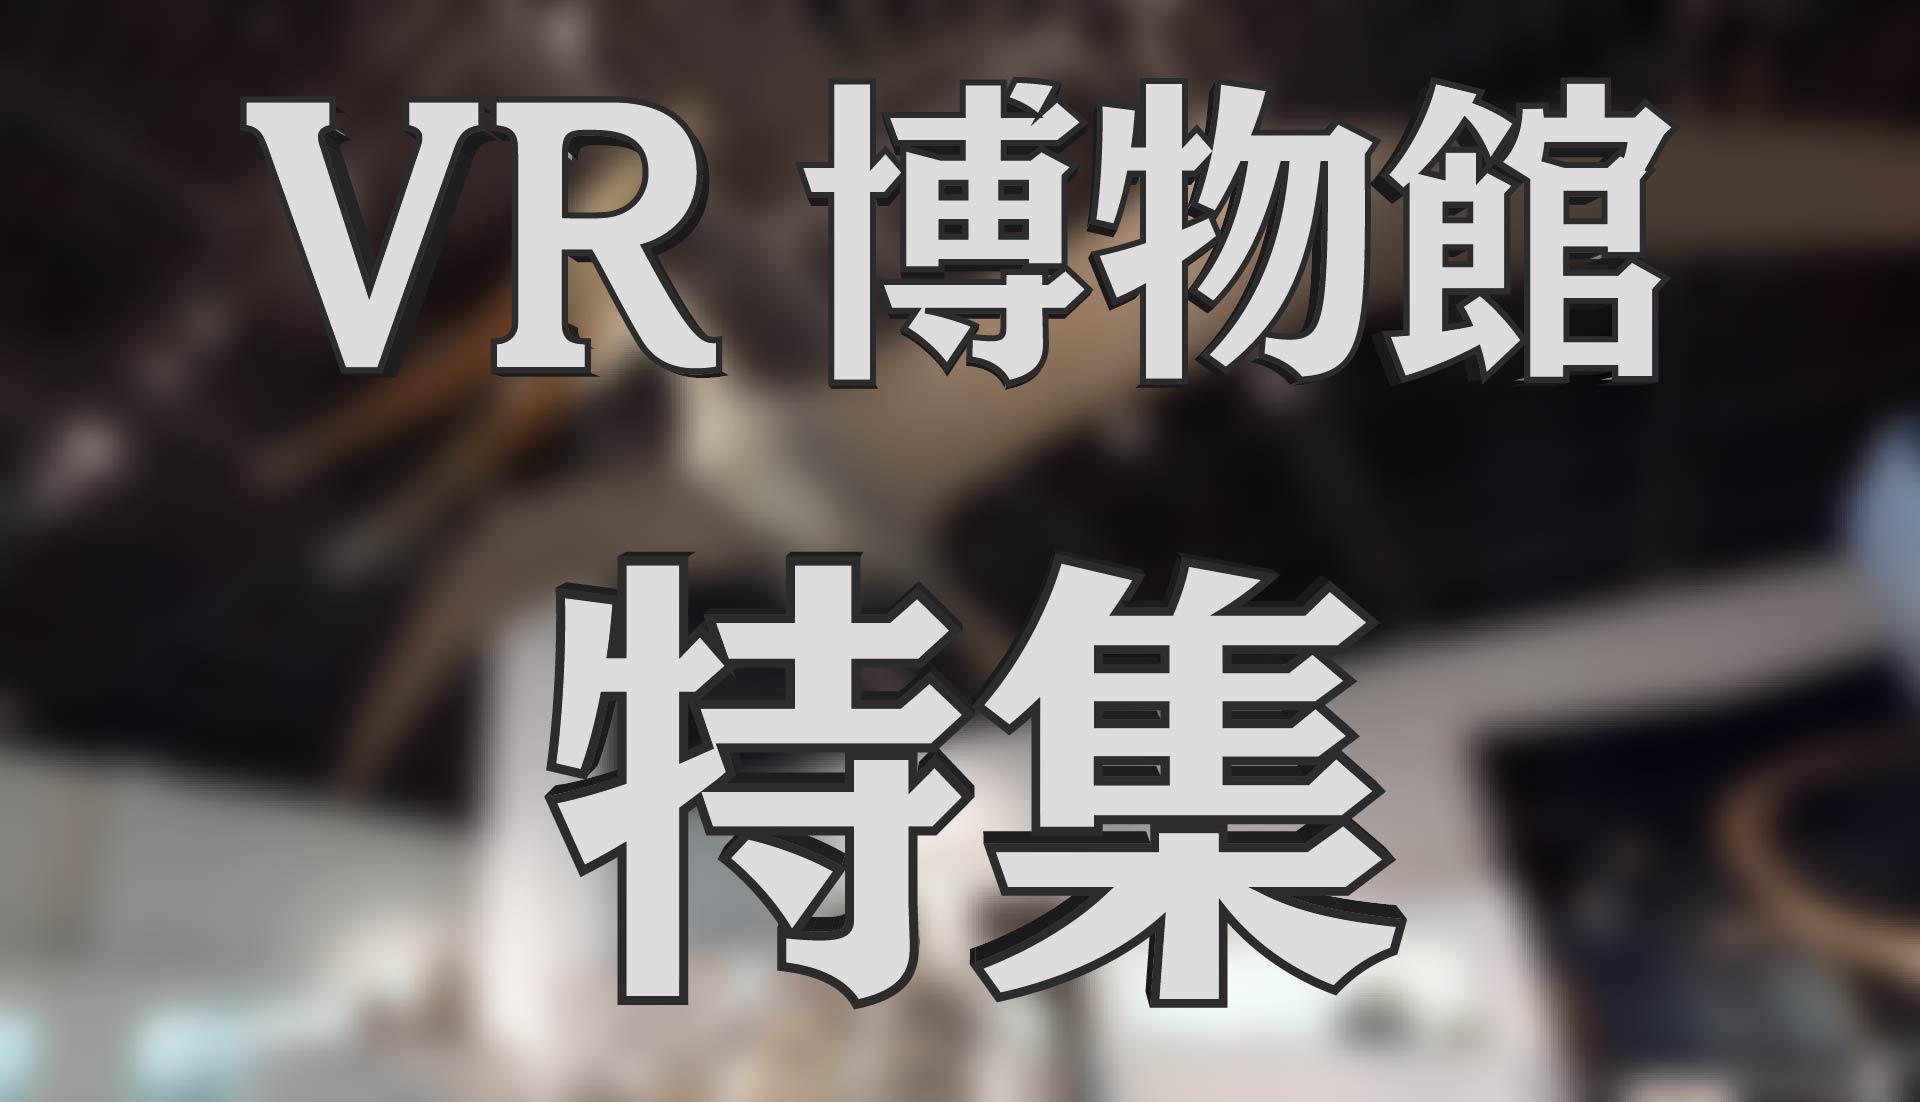 VR博物館